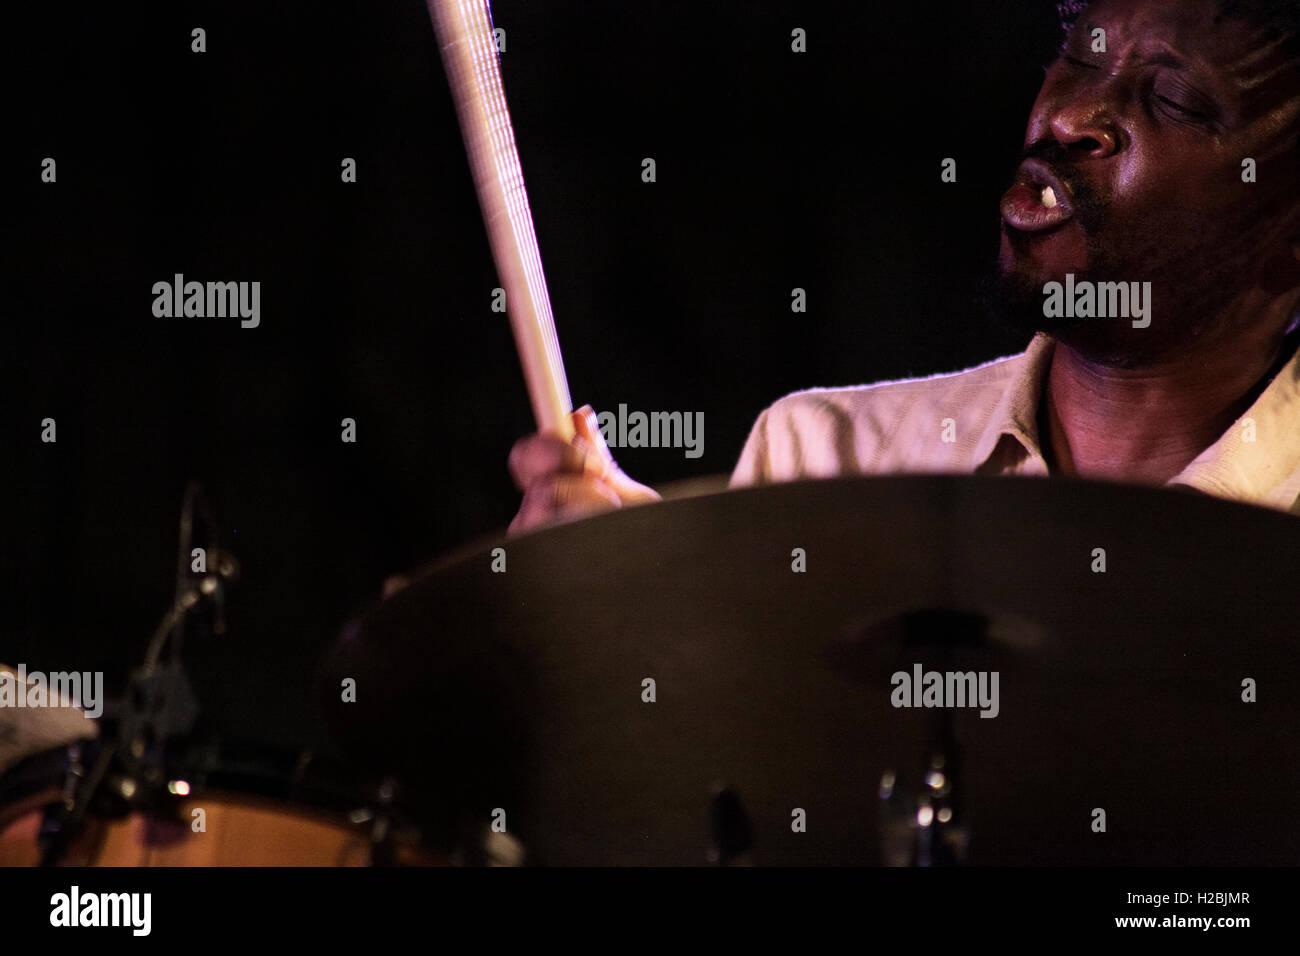 Sonny Troupé performs live during Lisa Simone' s concert. - Stock Image